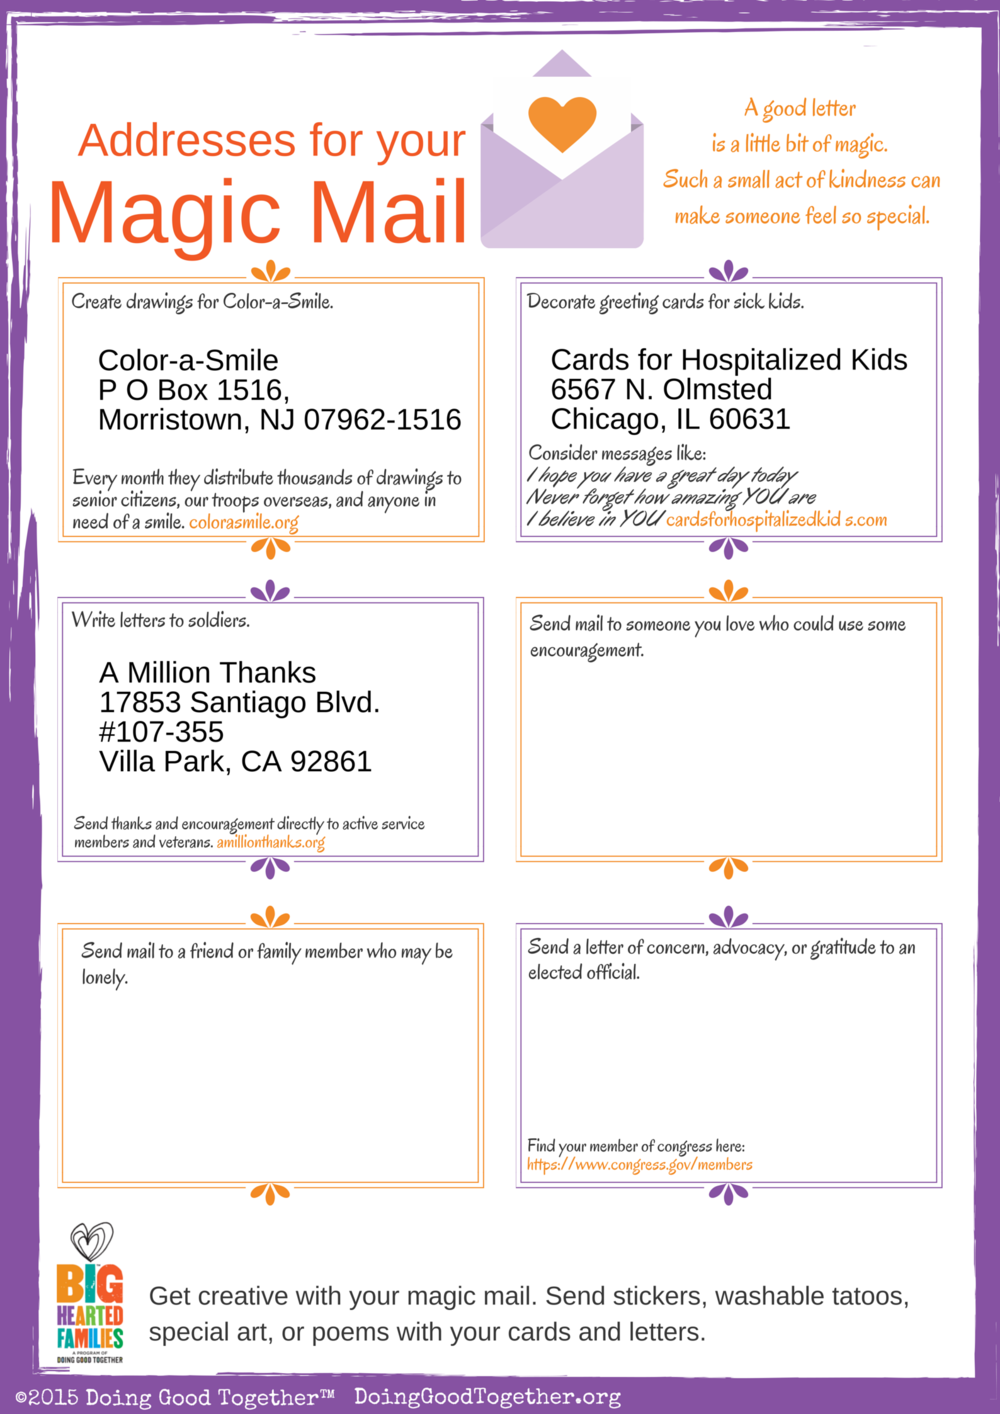 Magic mail image.png